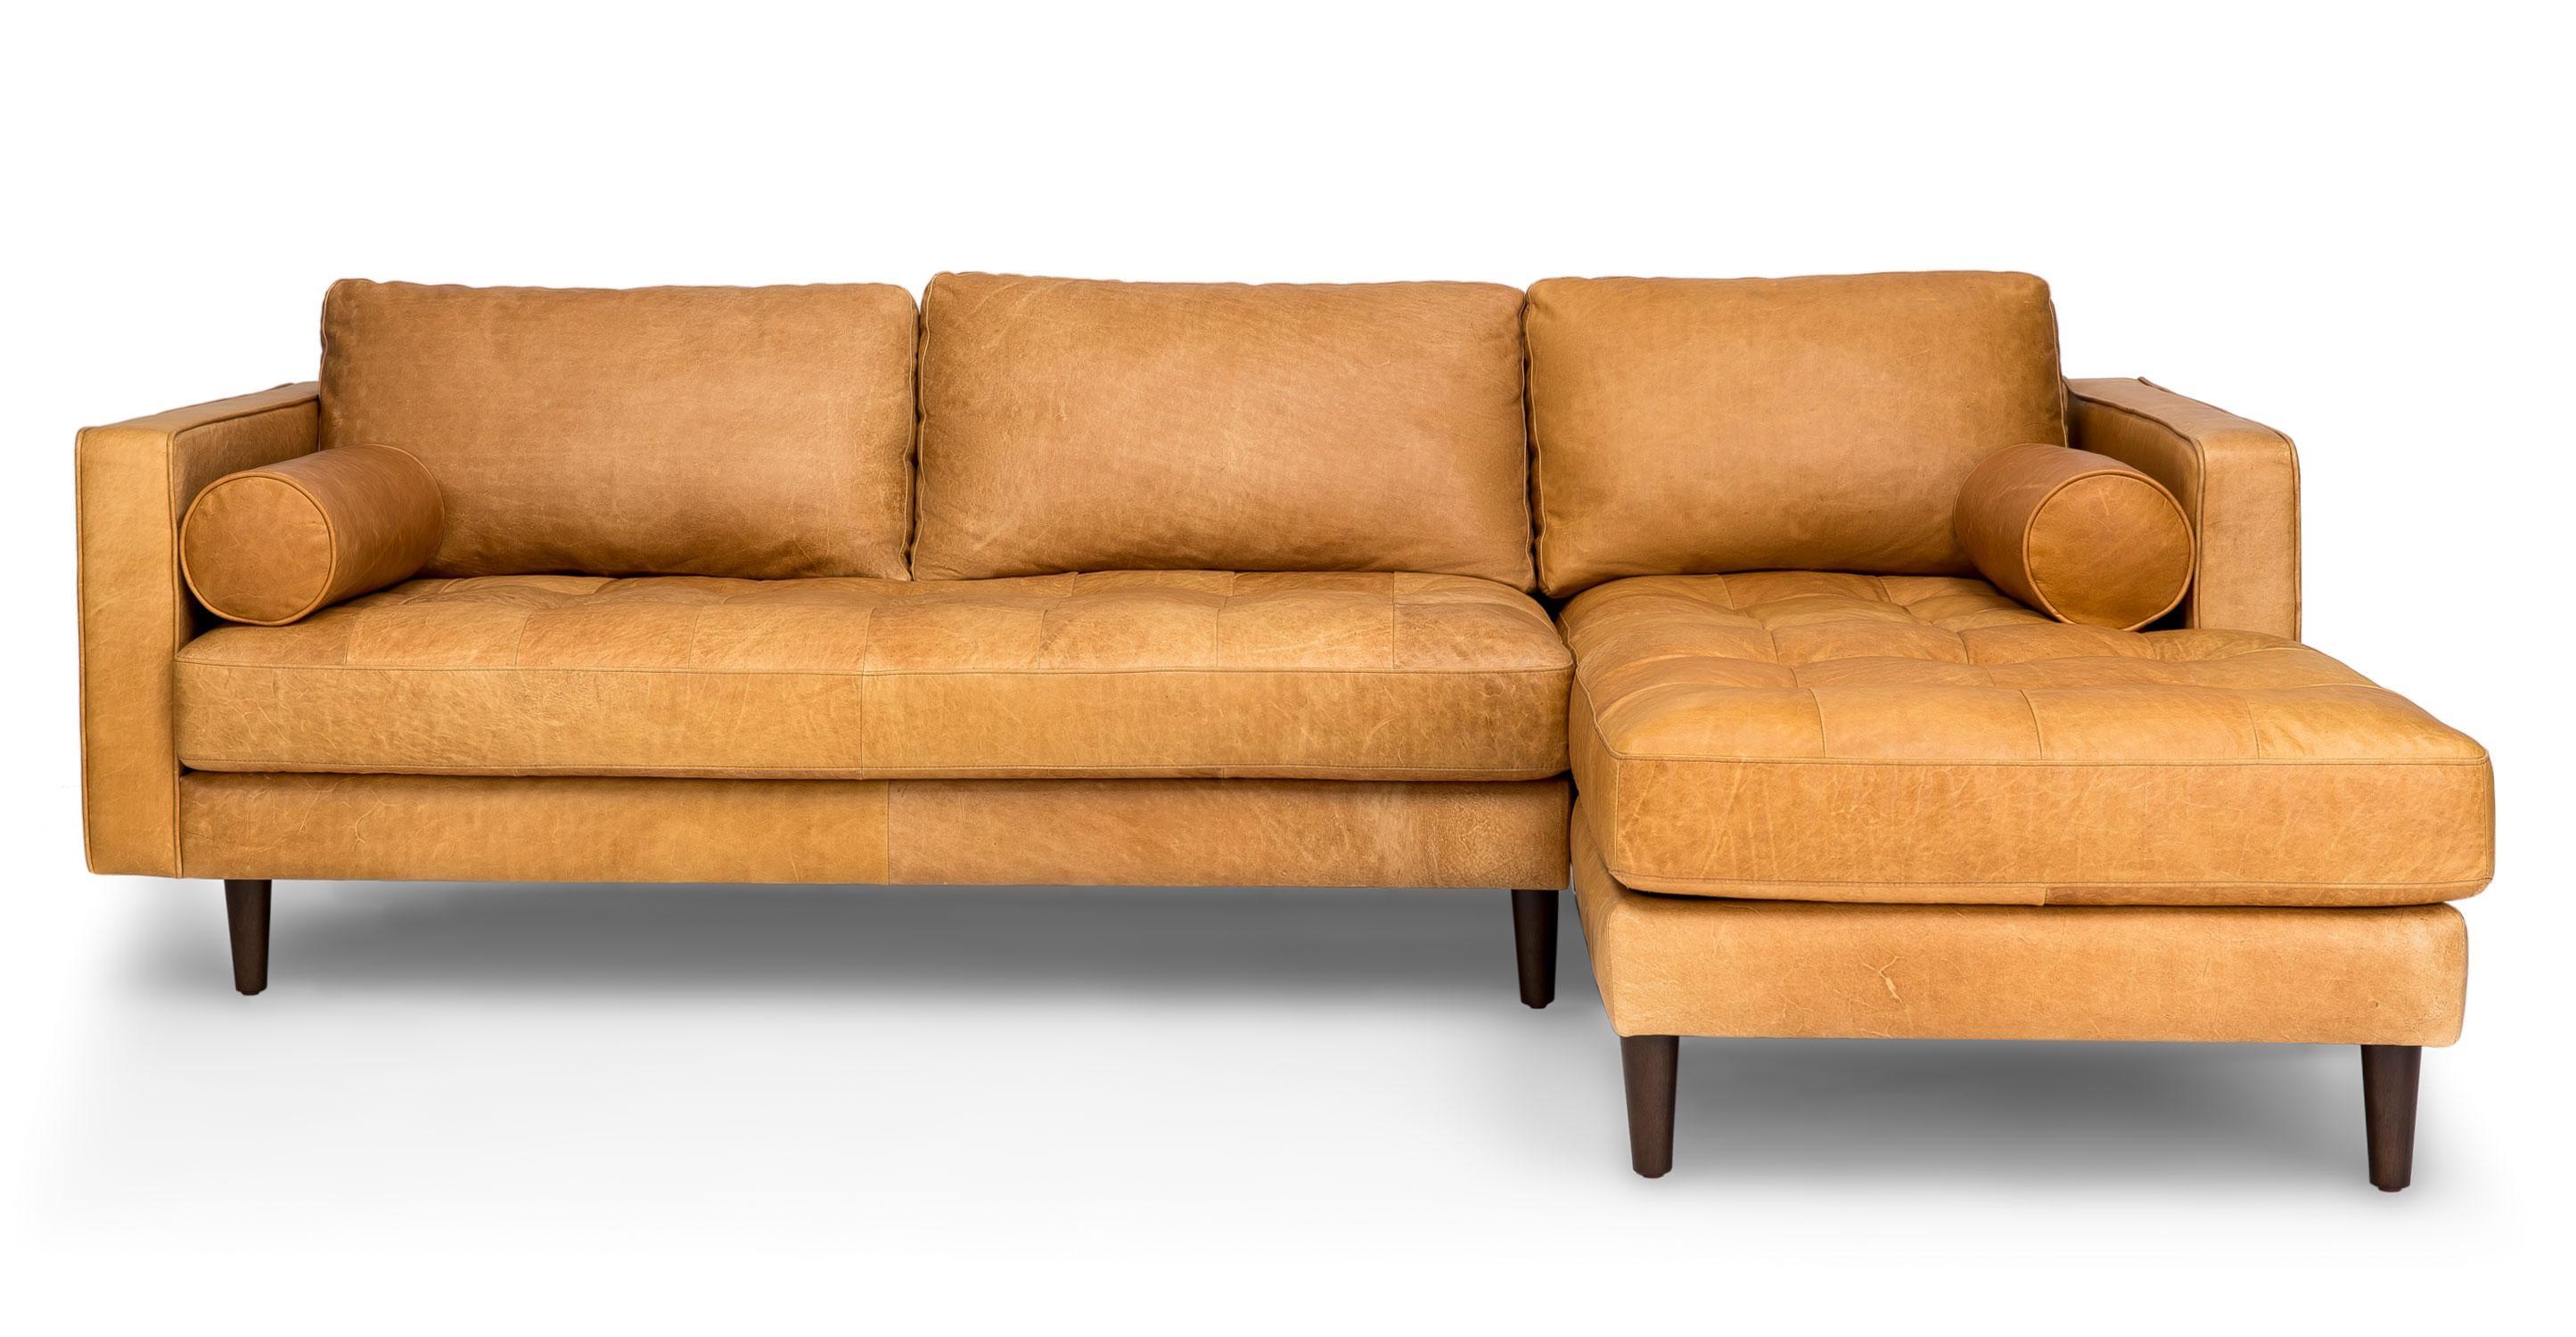 Modern Sectional Sofa Toronto (View 14 of 15)